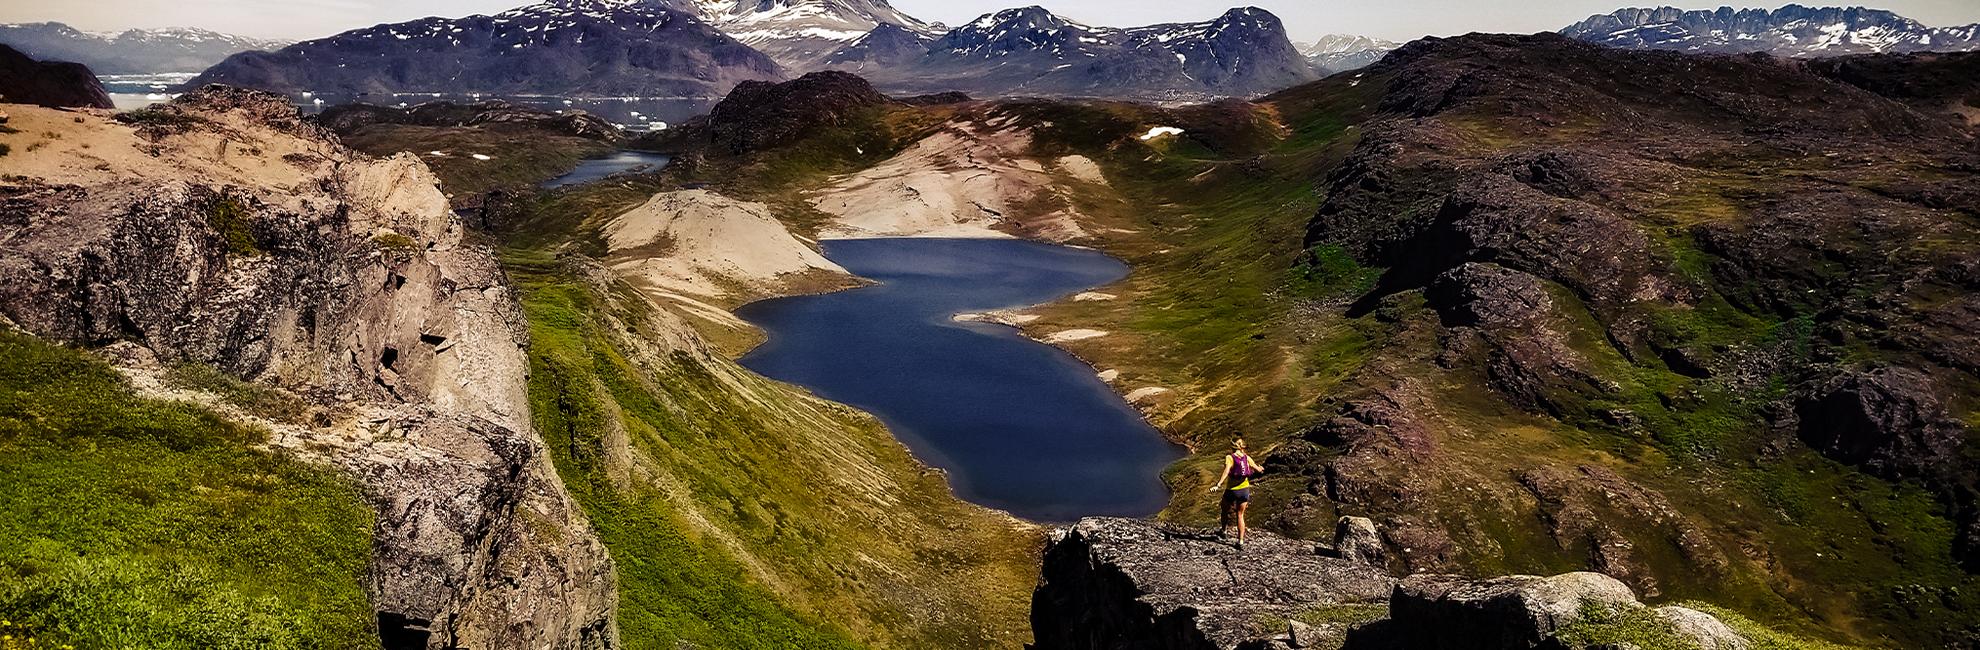 Yahnnybly-yahnnyadolfosanluis-greenland-trailrunning-adventure